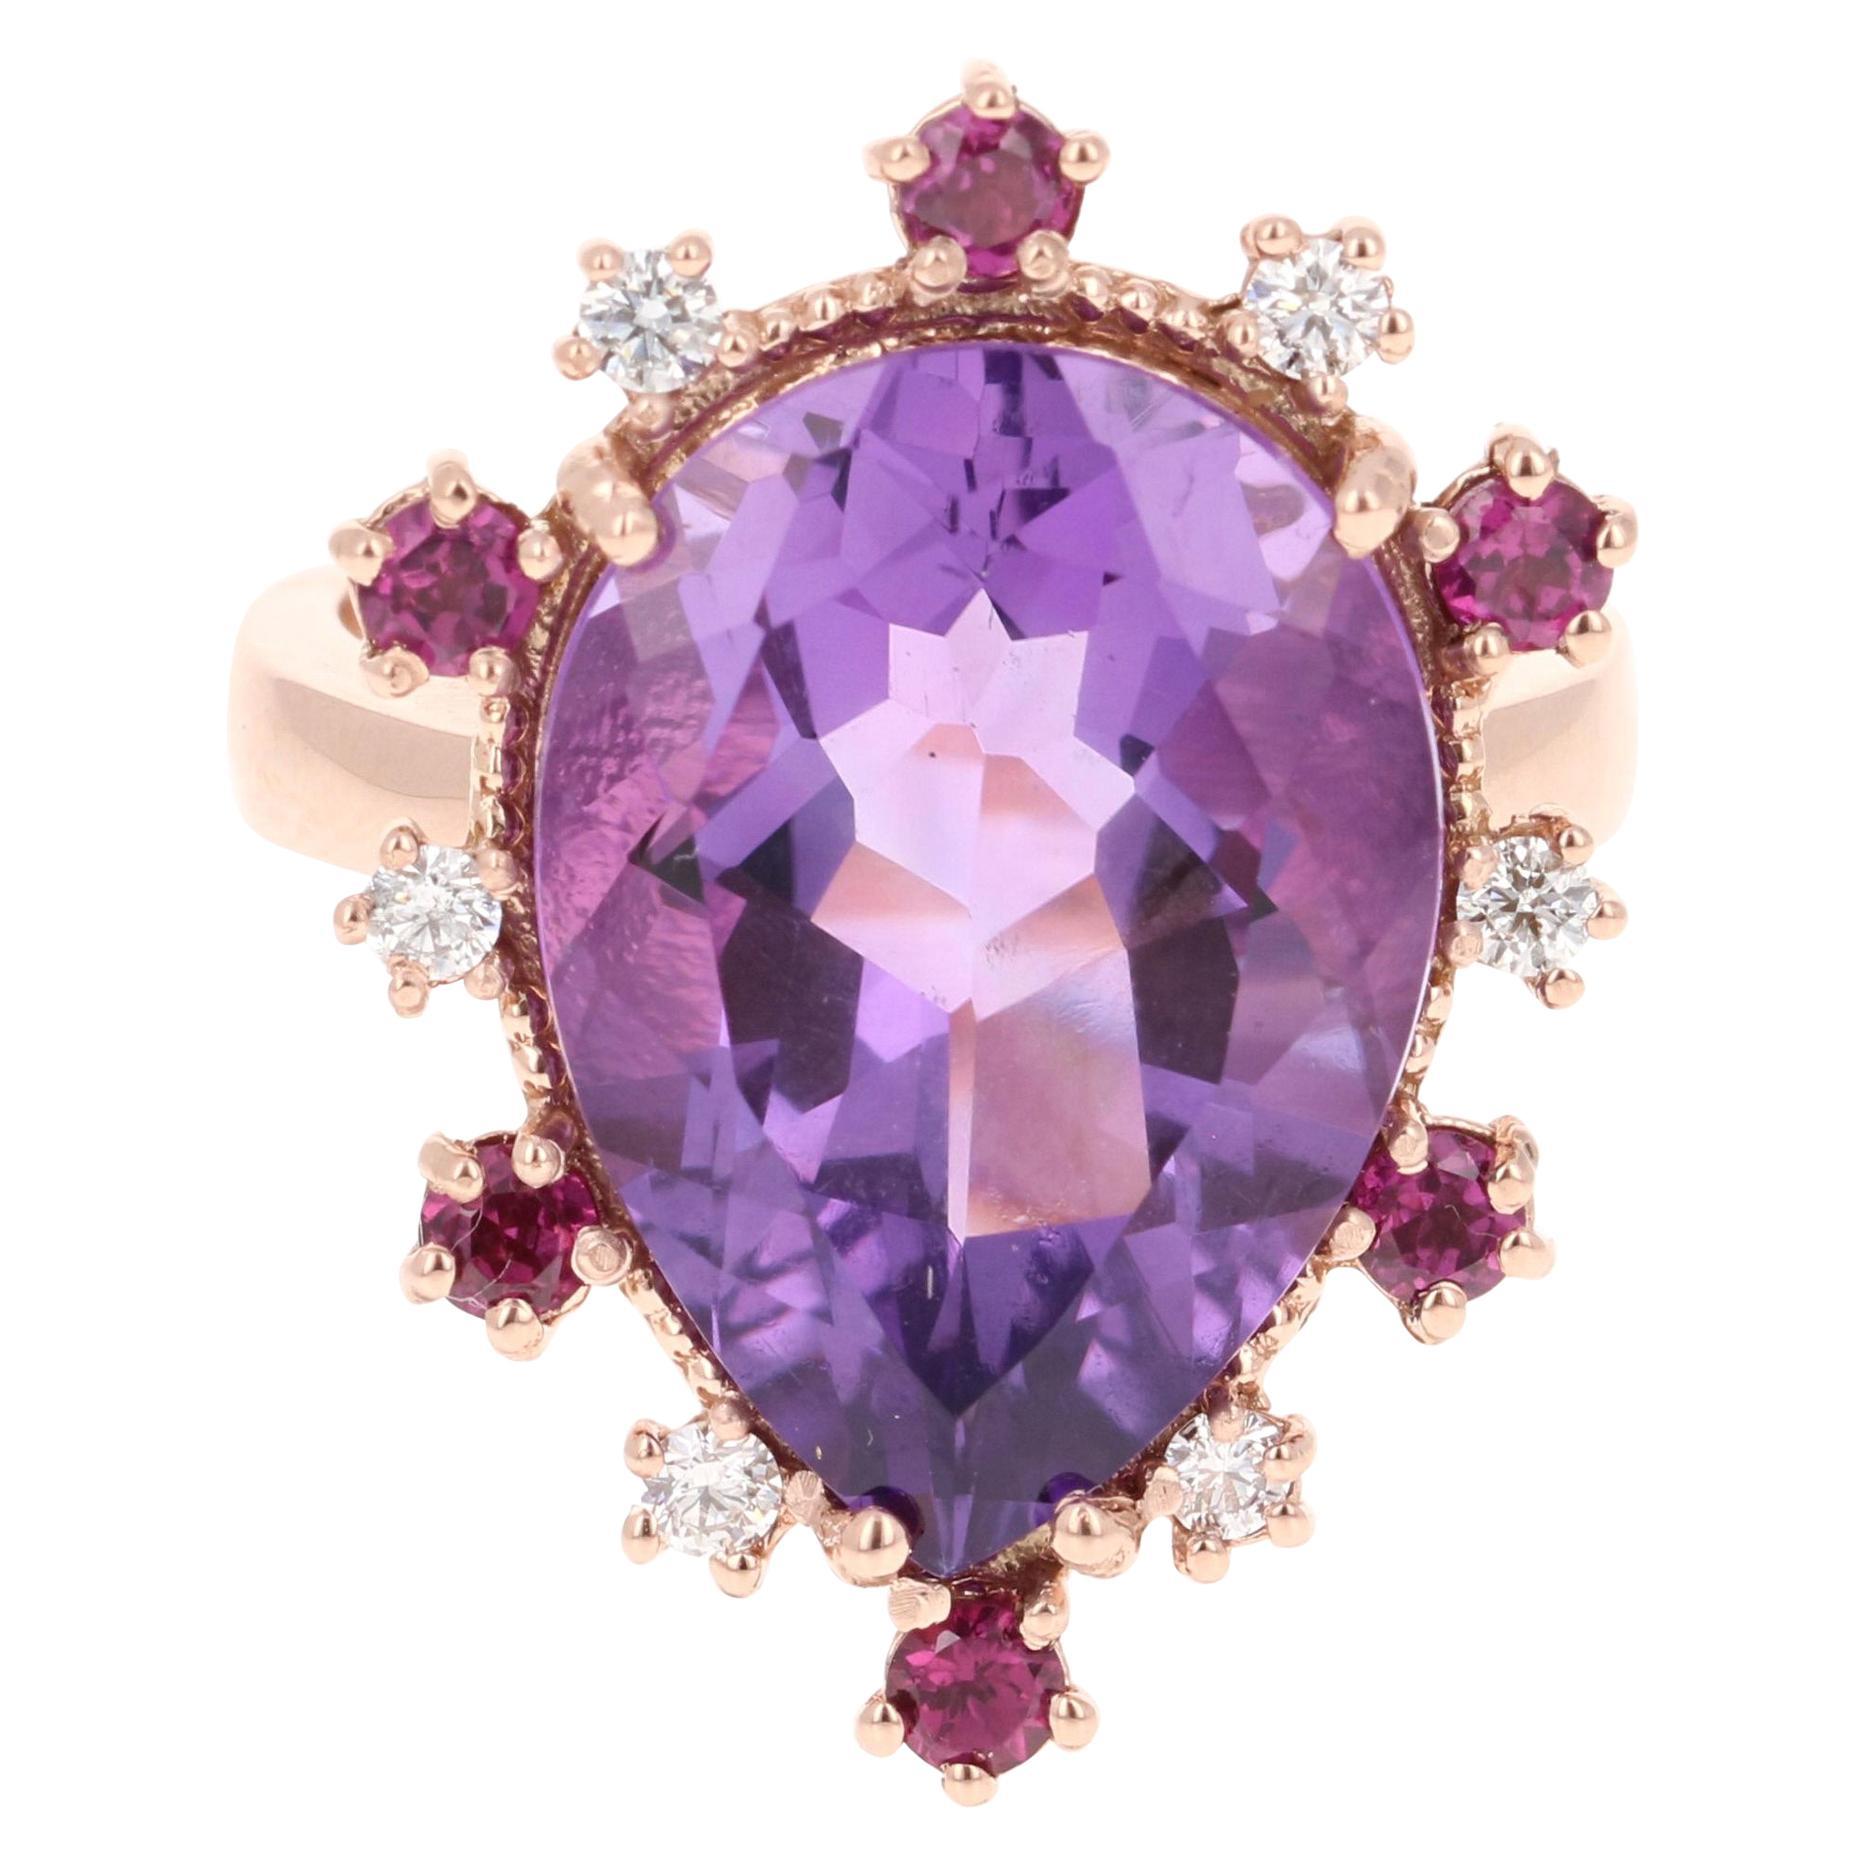 10.16 Carat Amethyst Garnet Diamond 14 Karat Rose Gold Ring